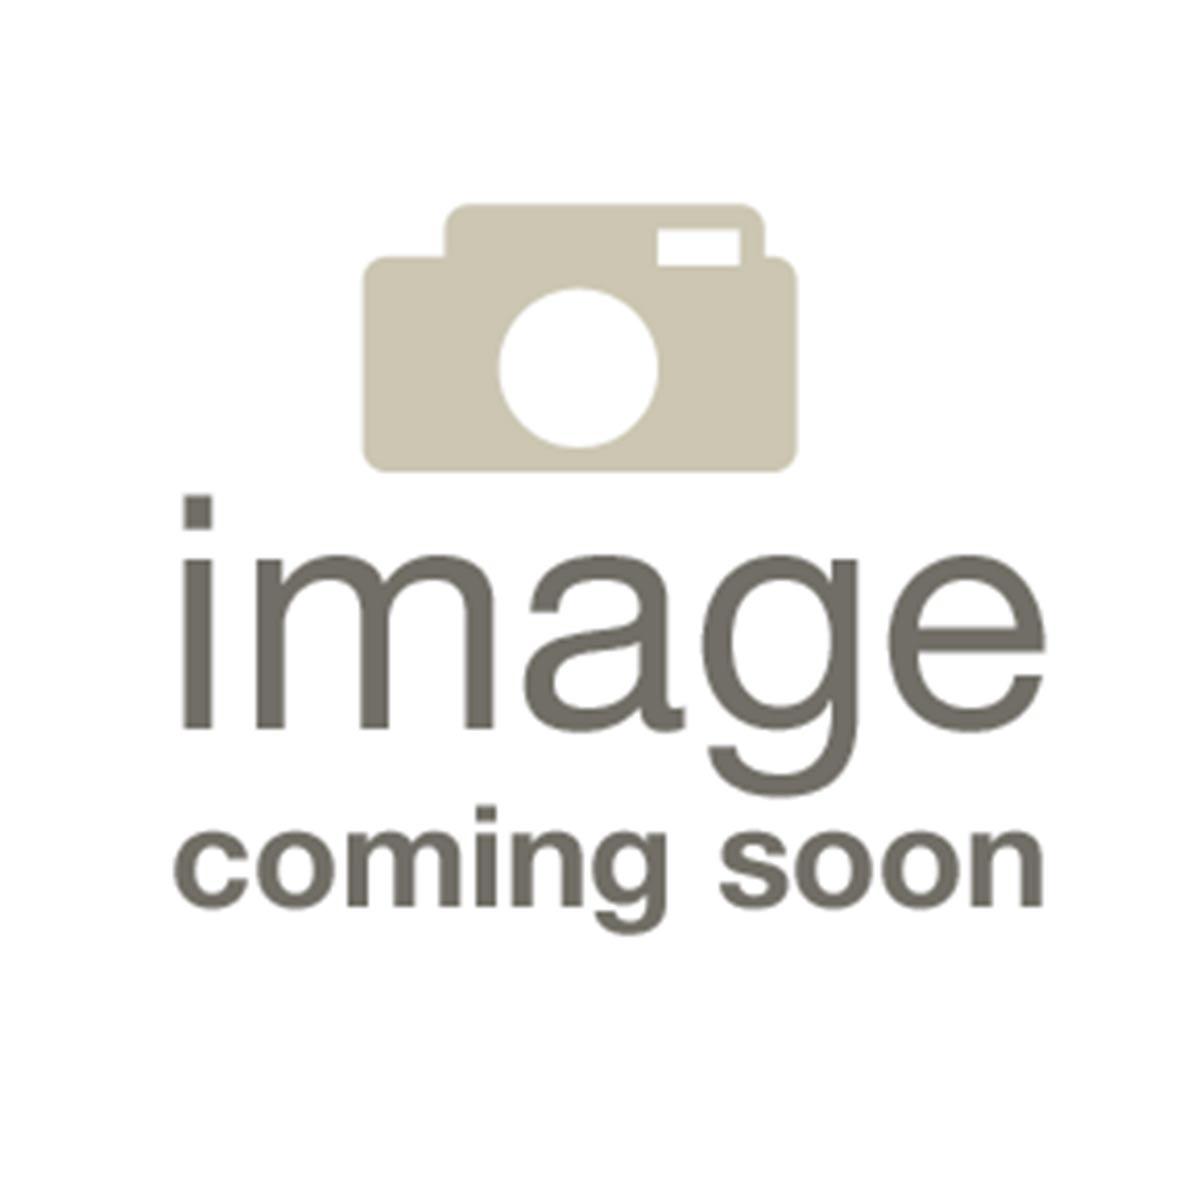 Touch Screen Smart Gloves - Fleece Lined  9759 - Grey Herringbone -